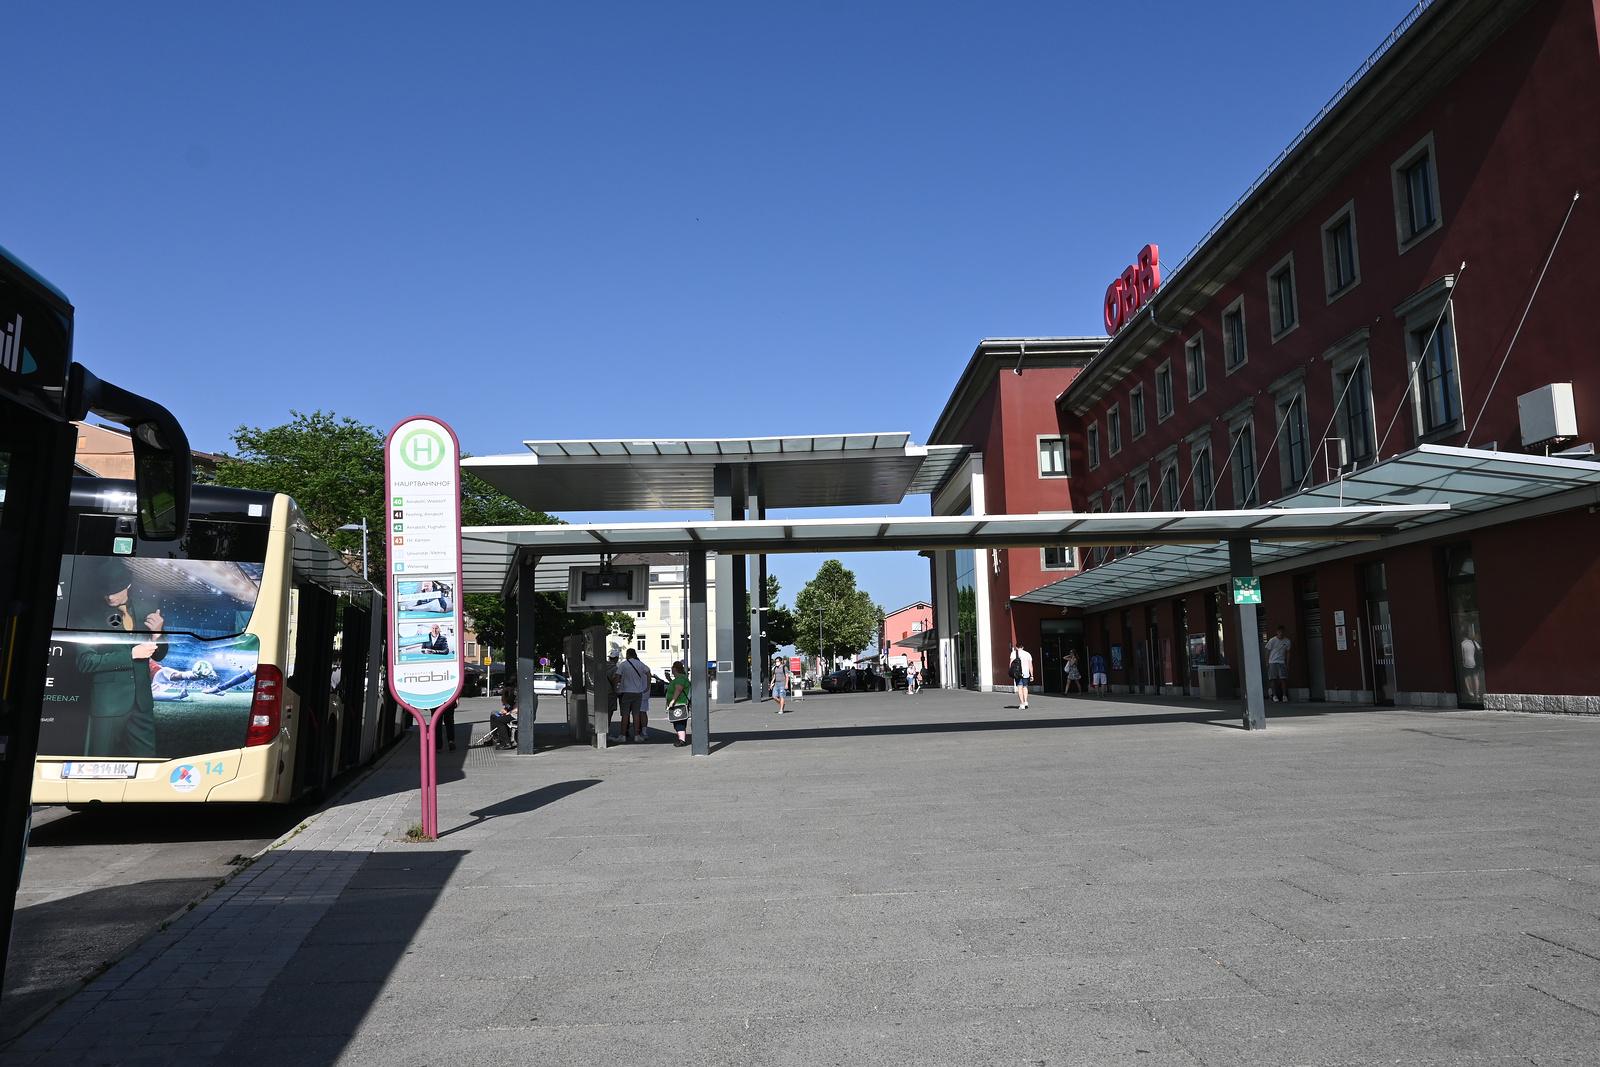 Klagenfurt Hauptbahnhof